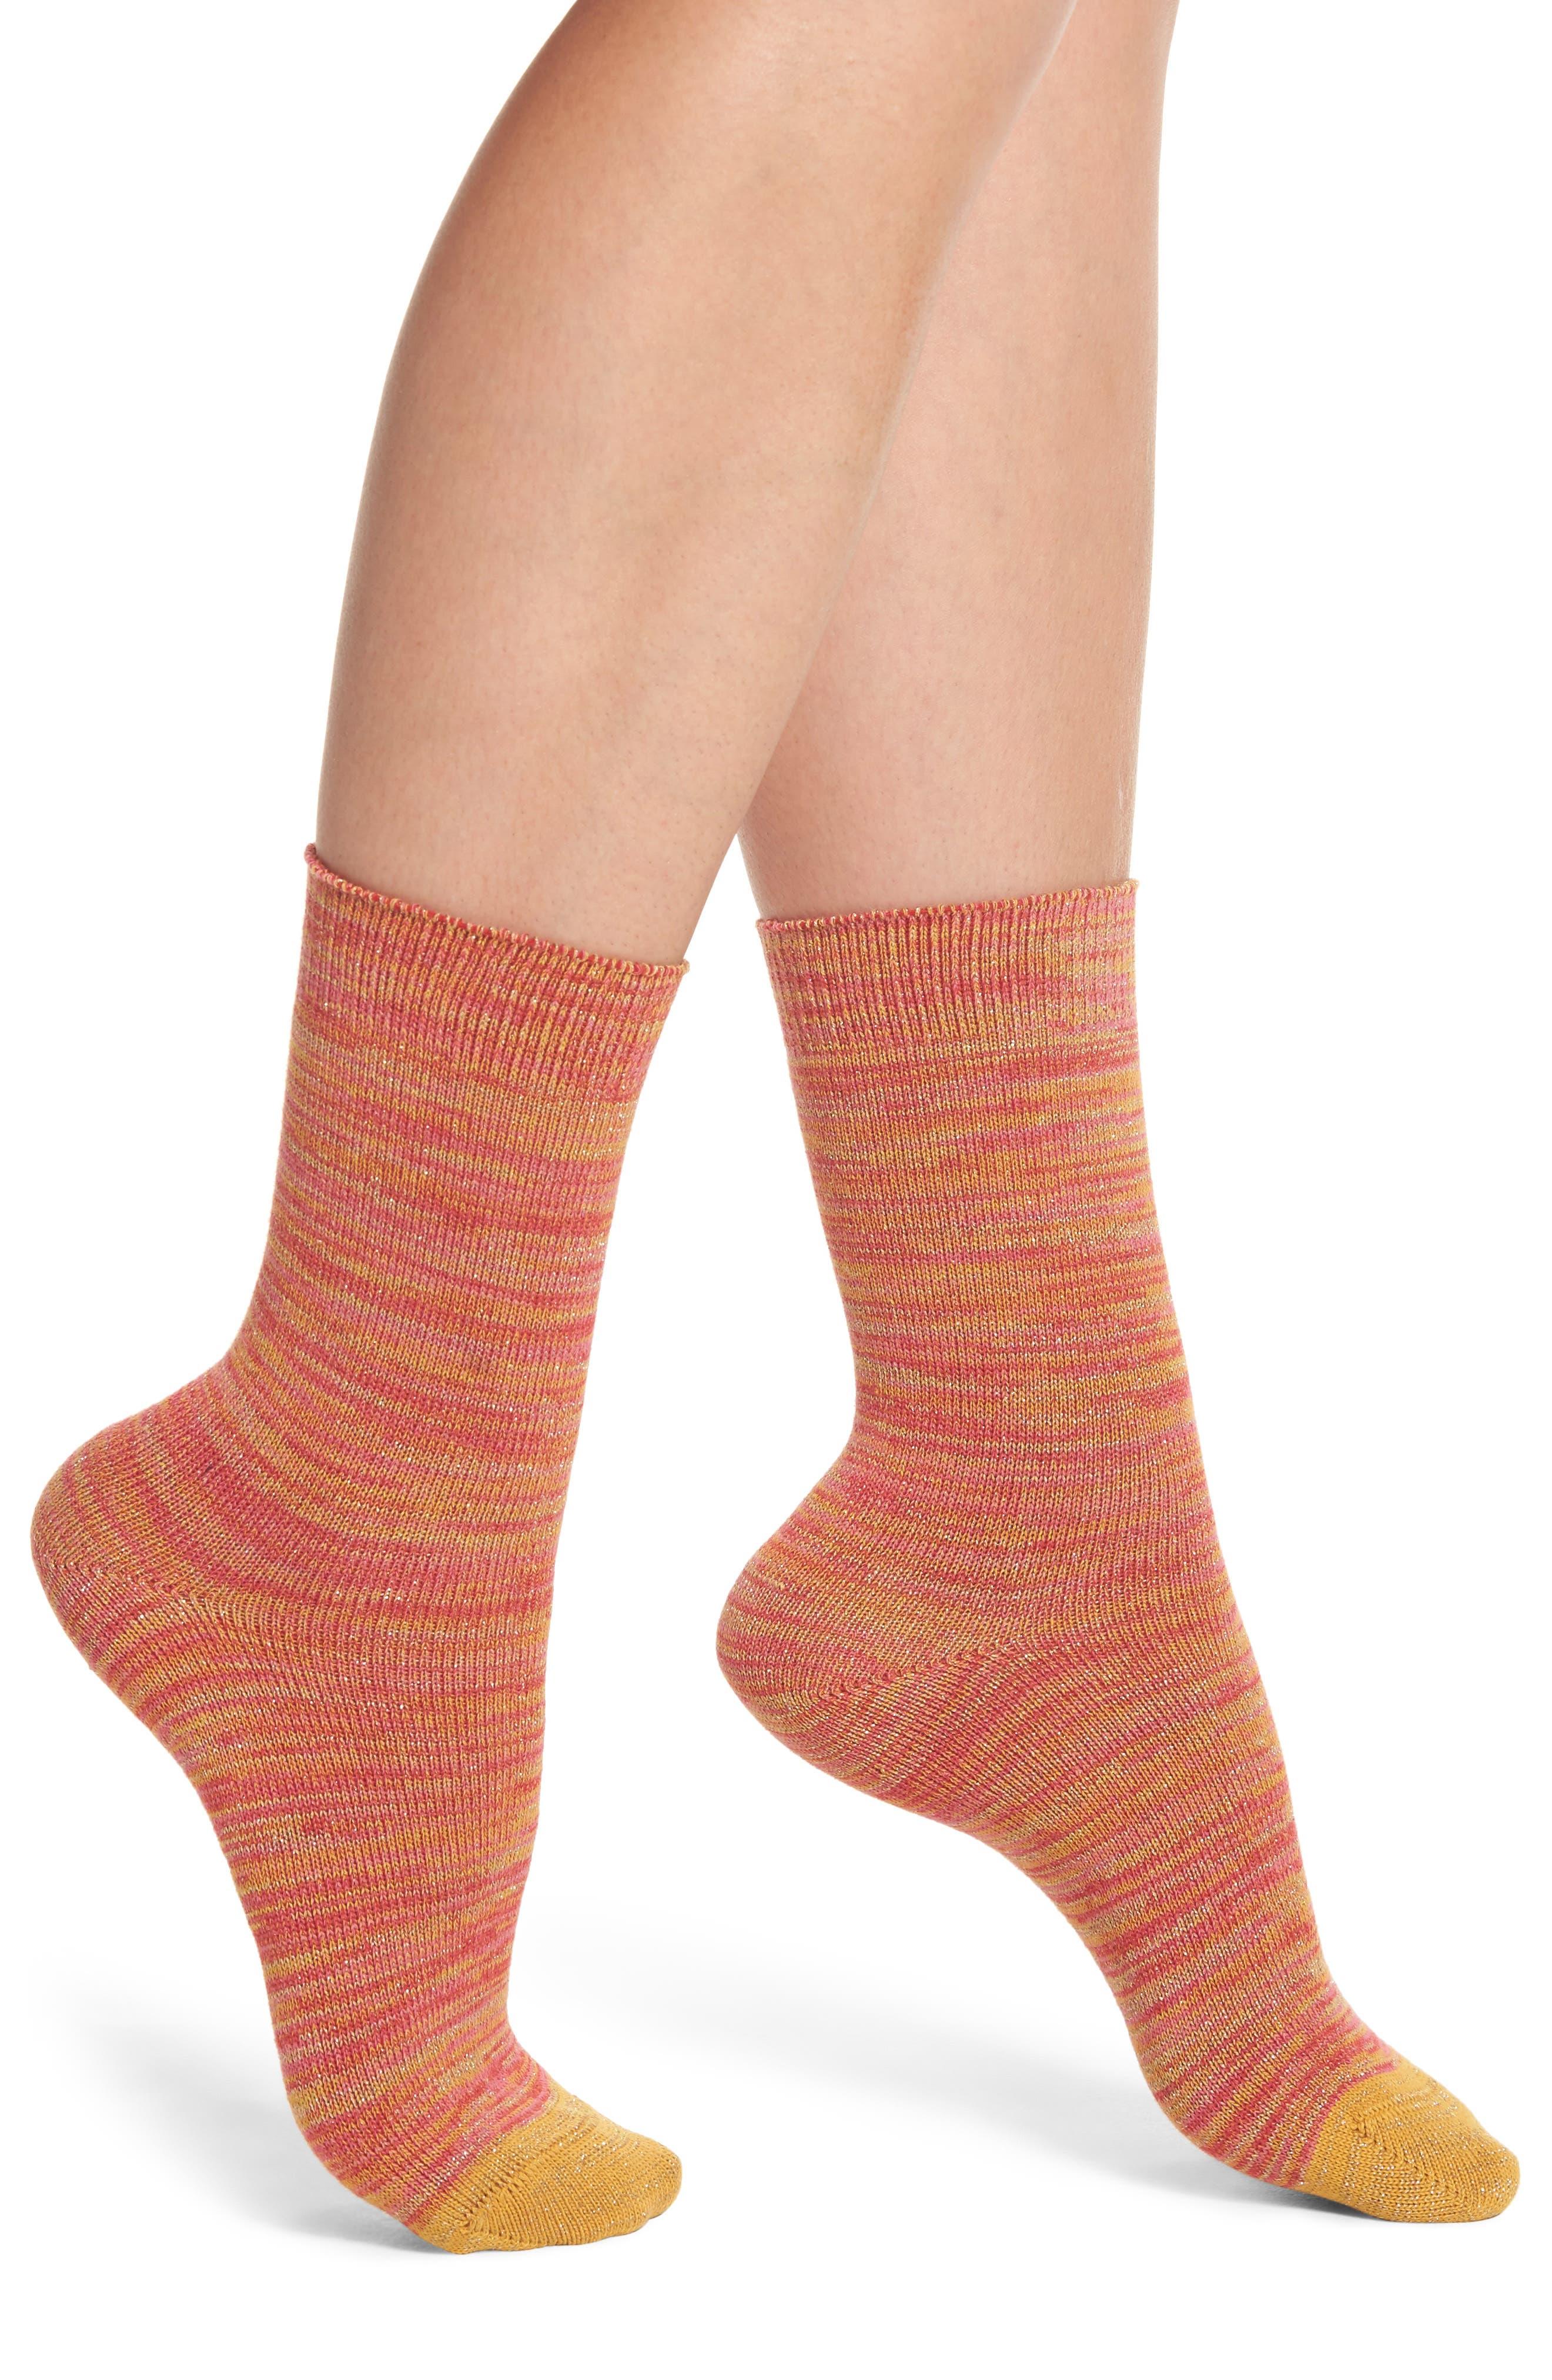 Emily Twinkletoes Crew Socks,                         Main,                         color, Multi Coral